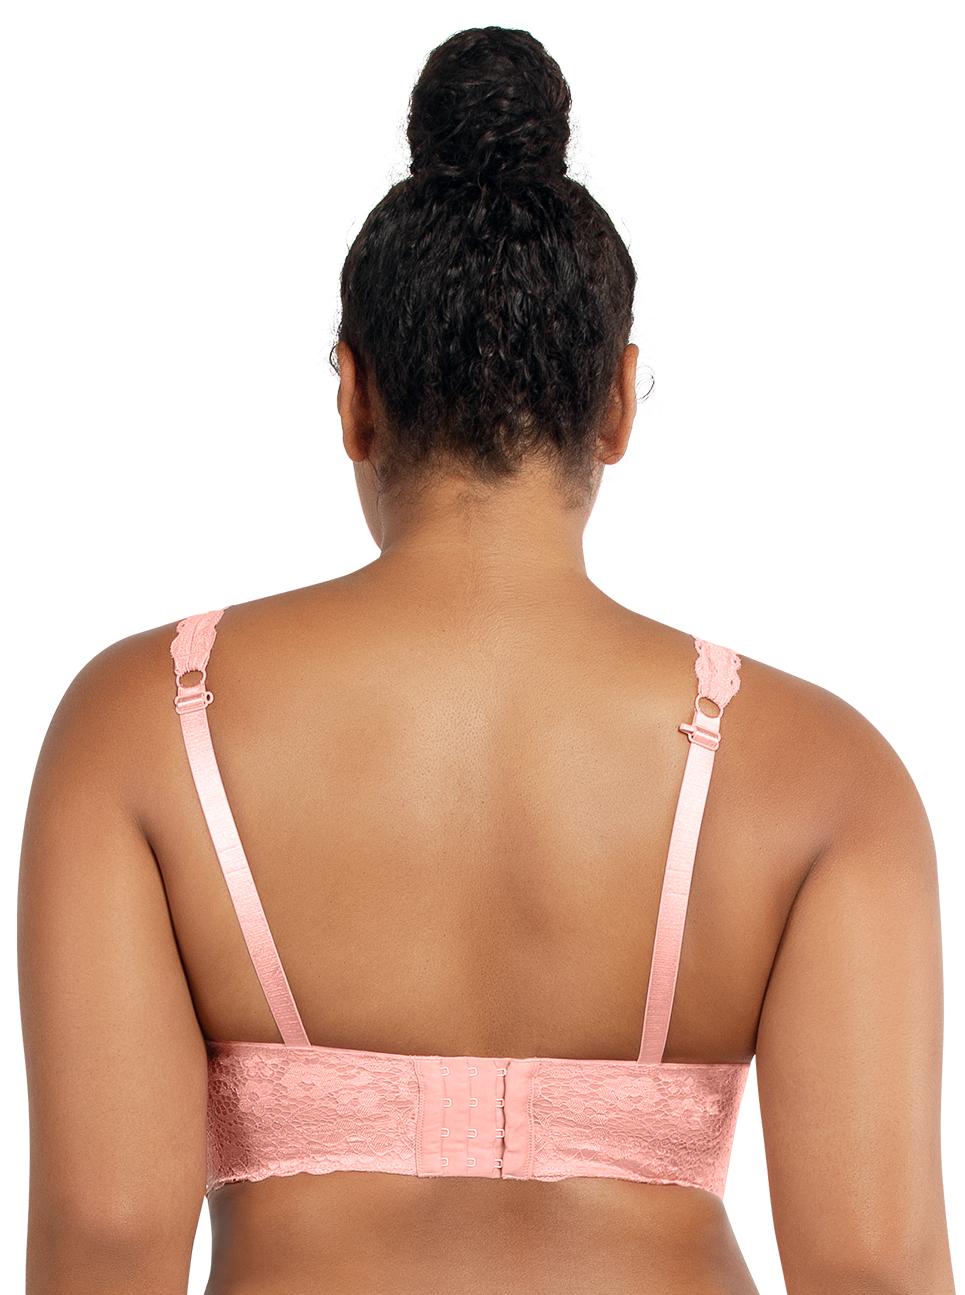 PARFAIT Adriana LaceBraletteP5482 PeachBud Back - Adriana Lace Bralette - Peach Bud - P5482